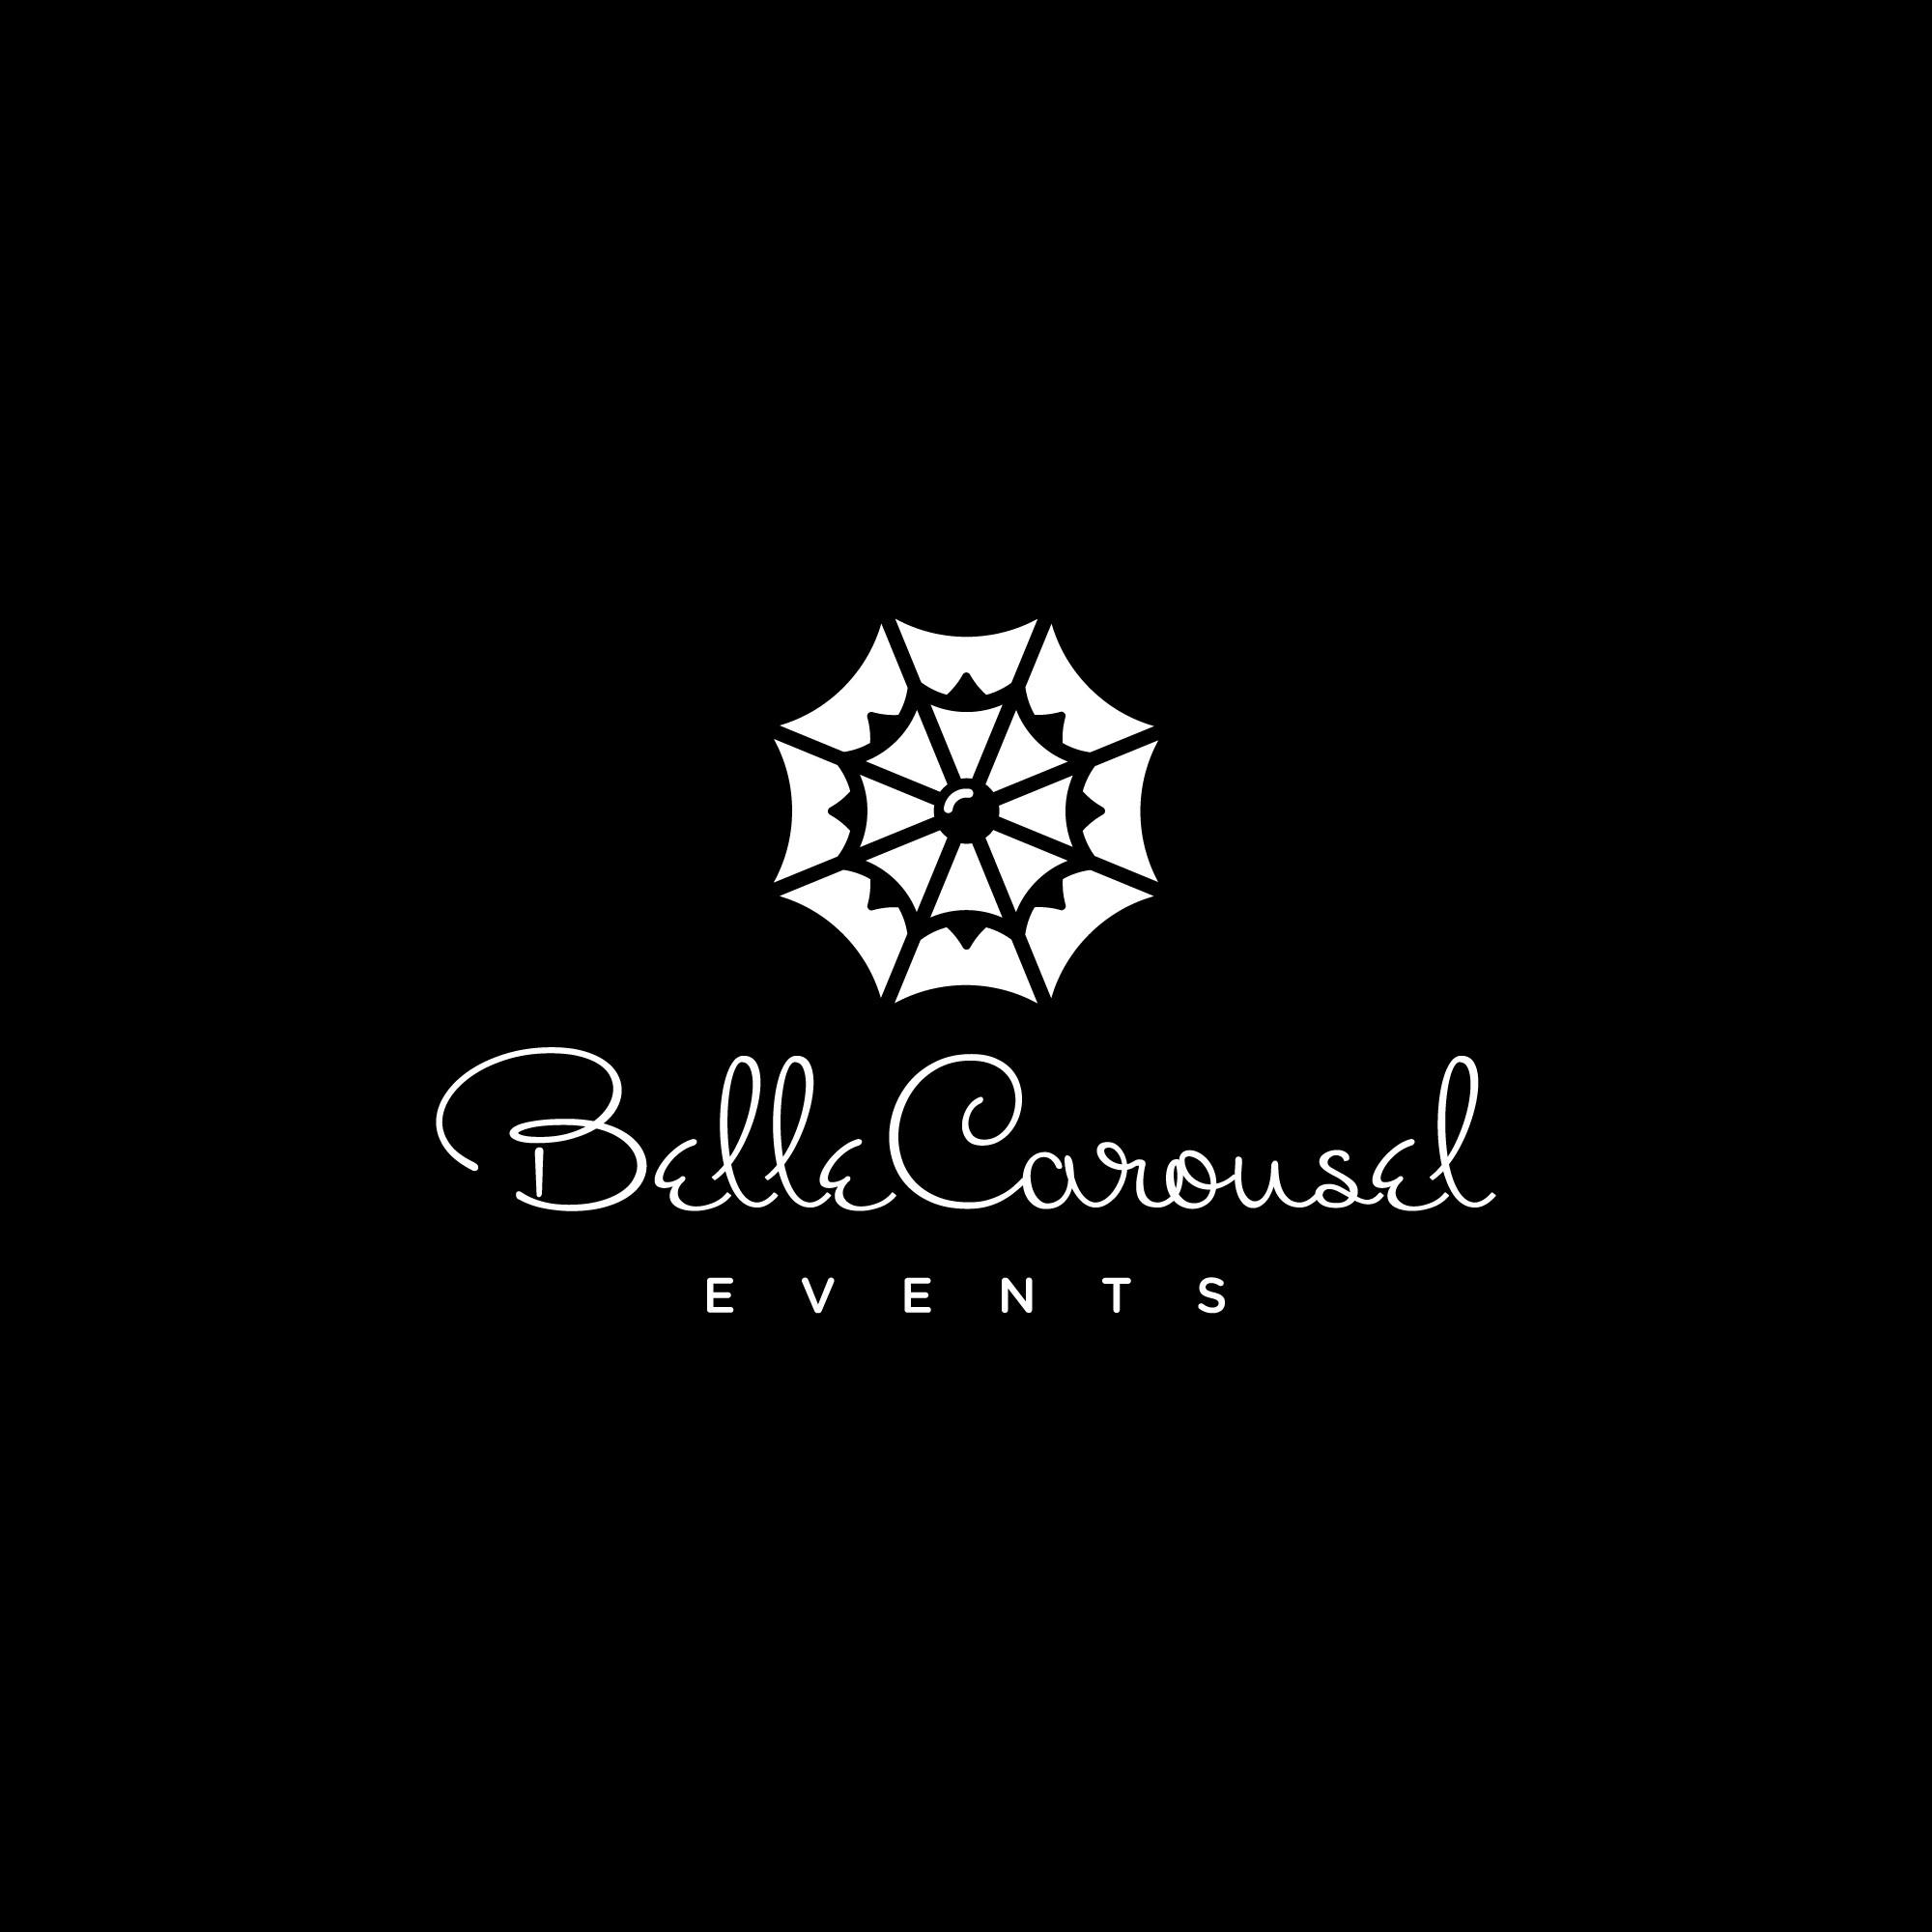 Design a fabulous logo for Belle Carousel Events!